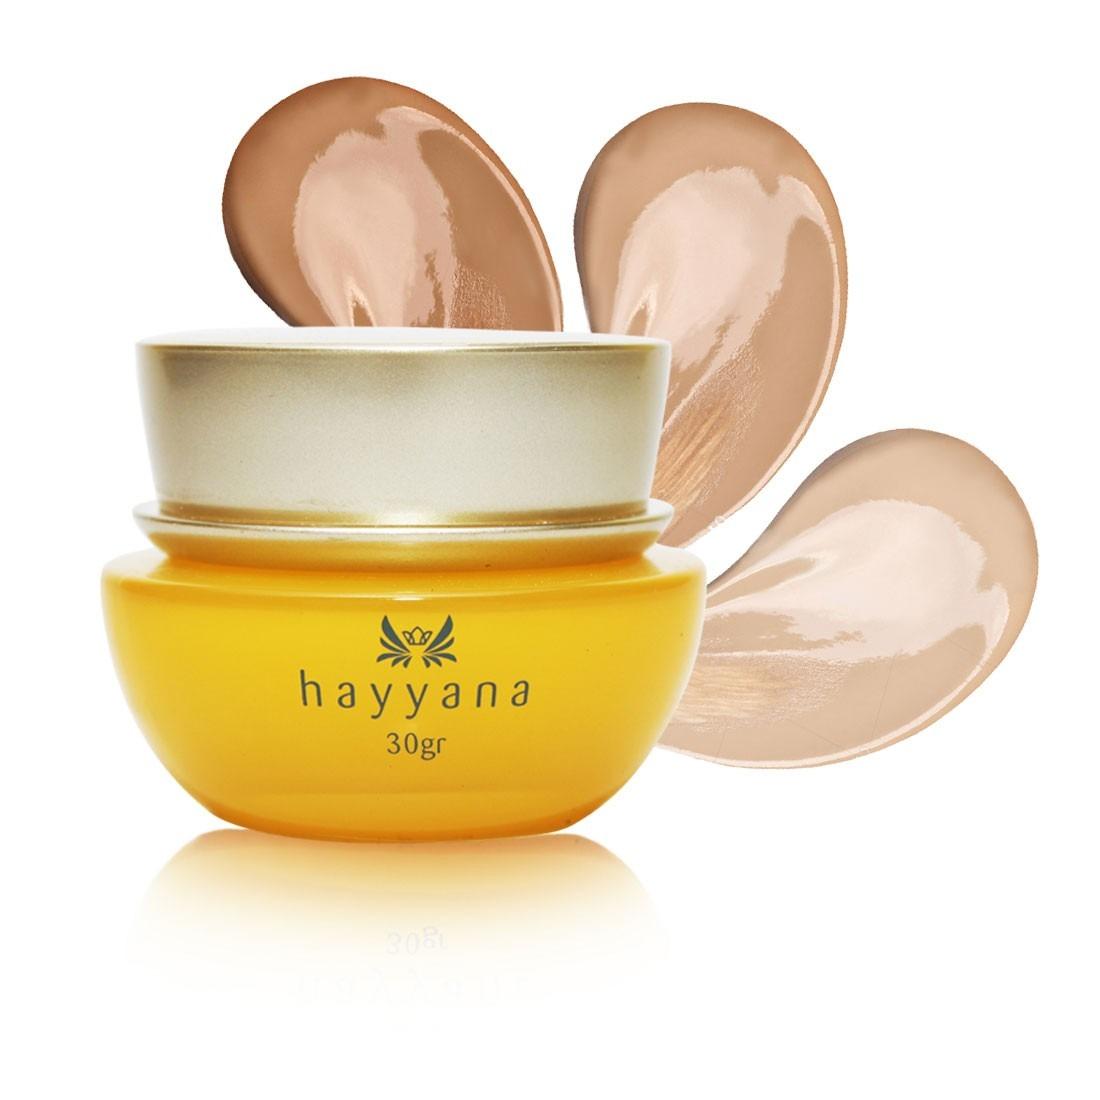 Hayyana Royal Golden Cocoon CC Cream